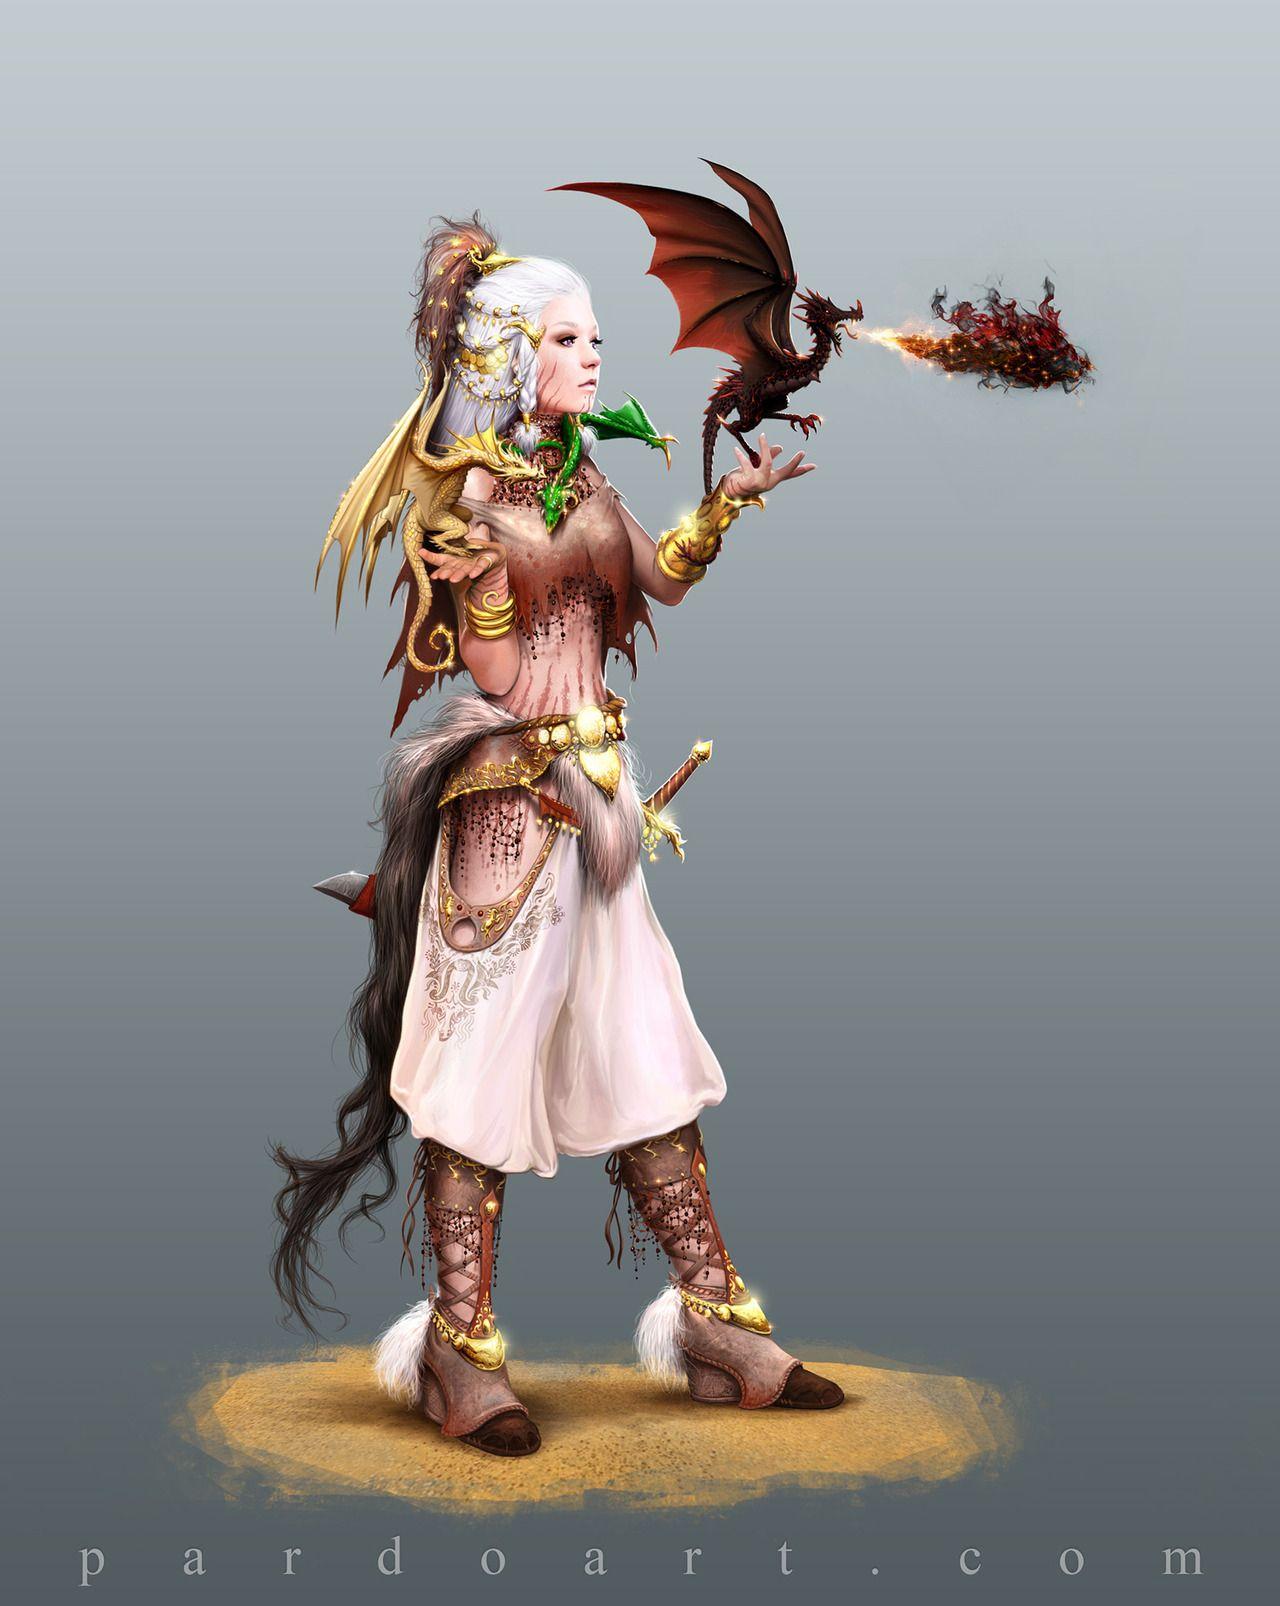 #Daenerys #Targaryen #dragons #asoiaf #grrm #agot #awesome